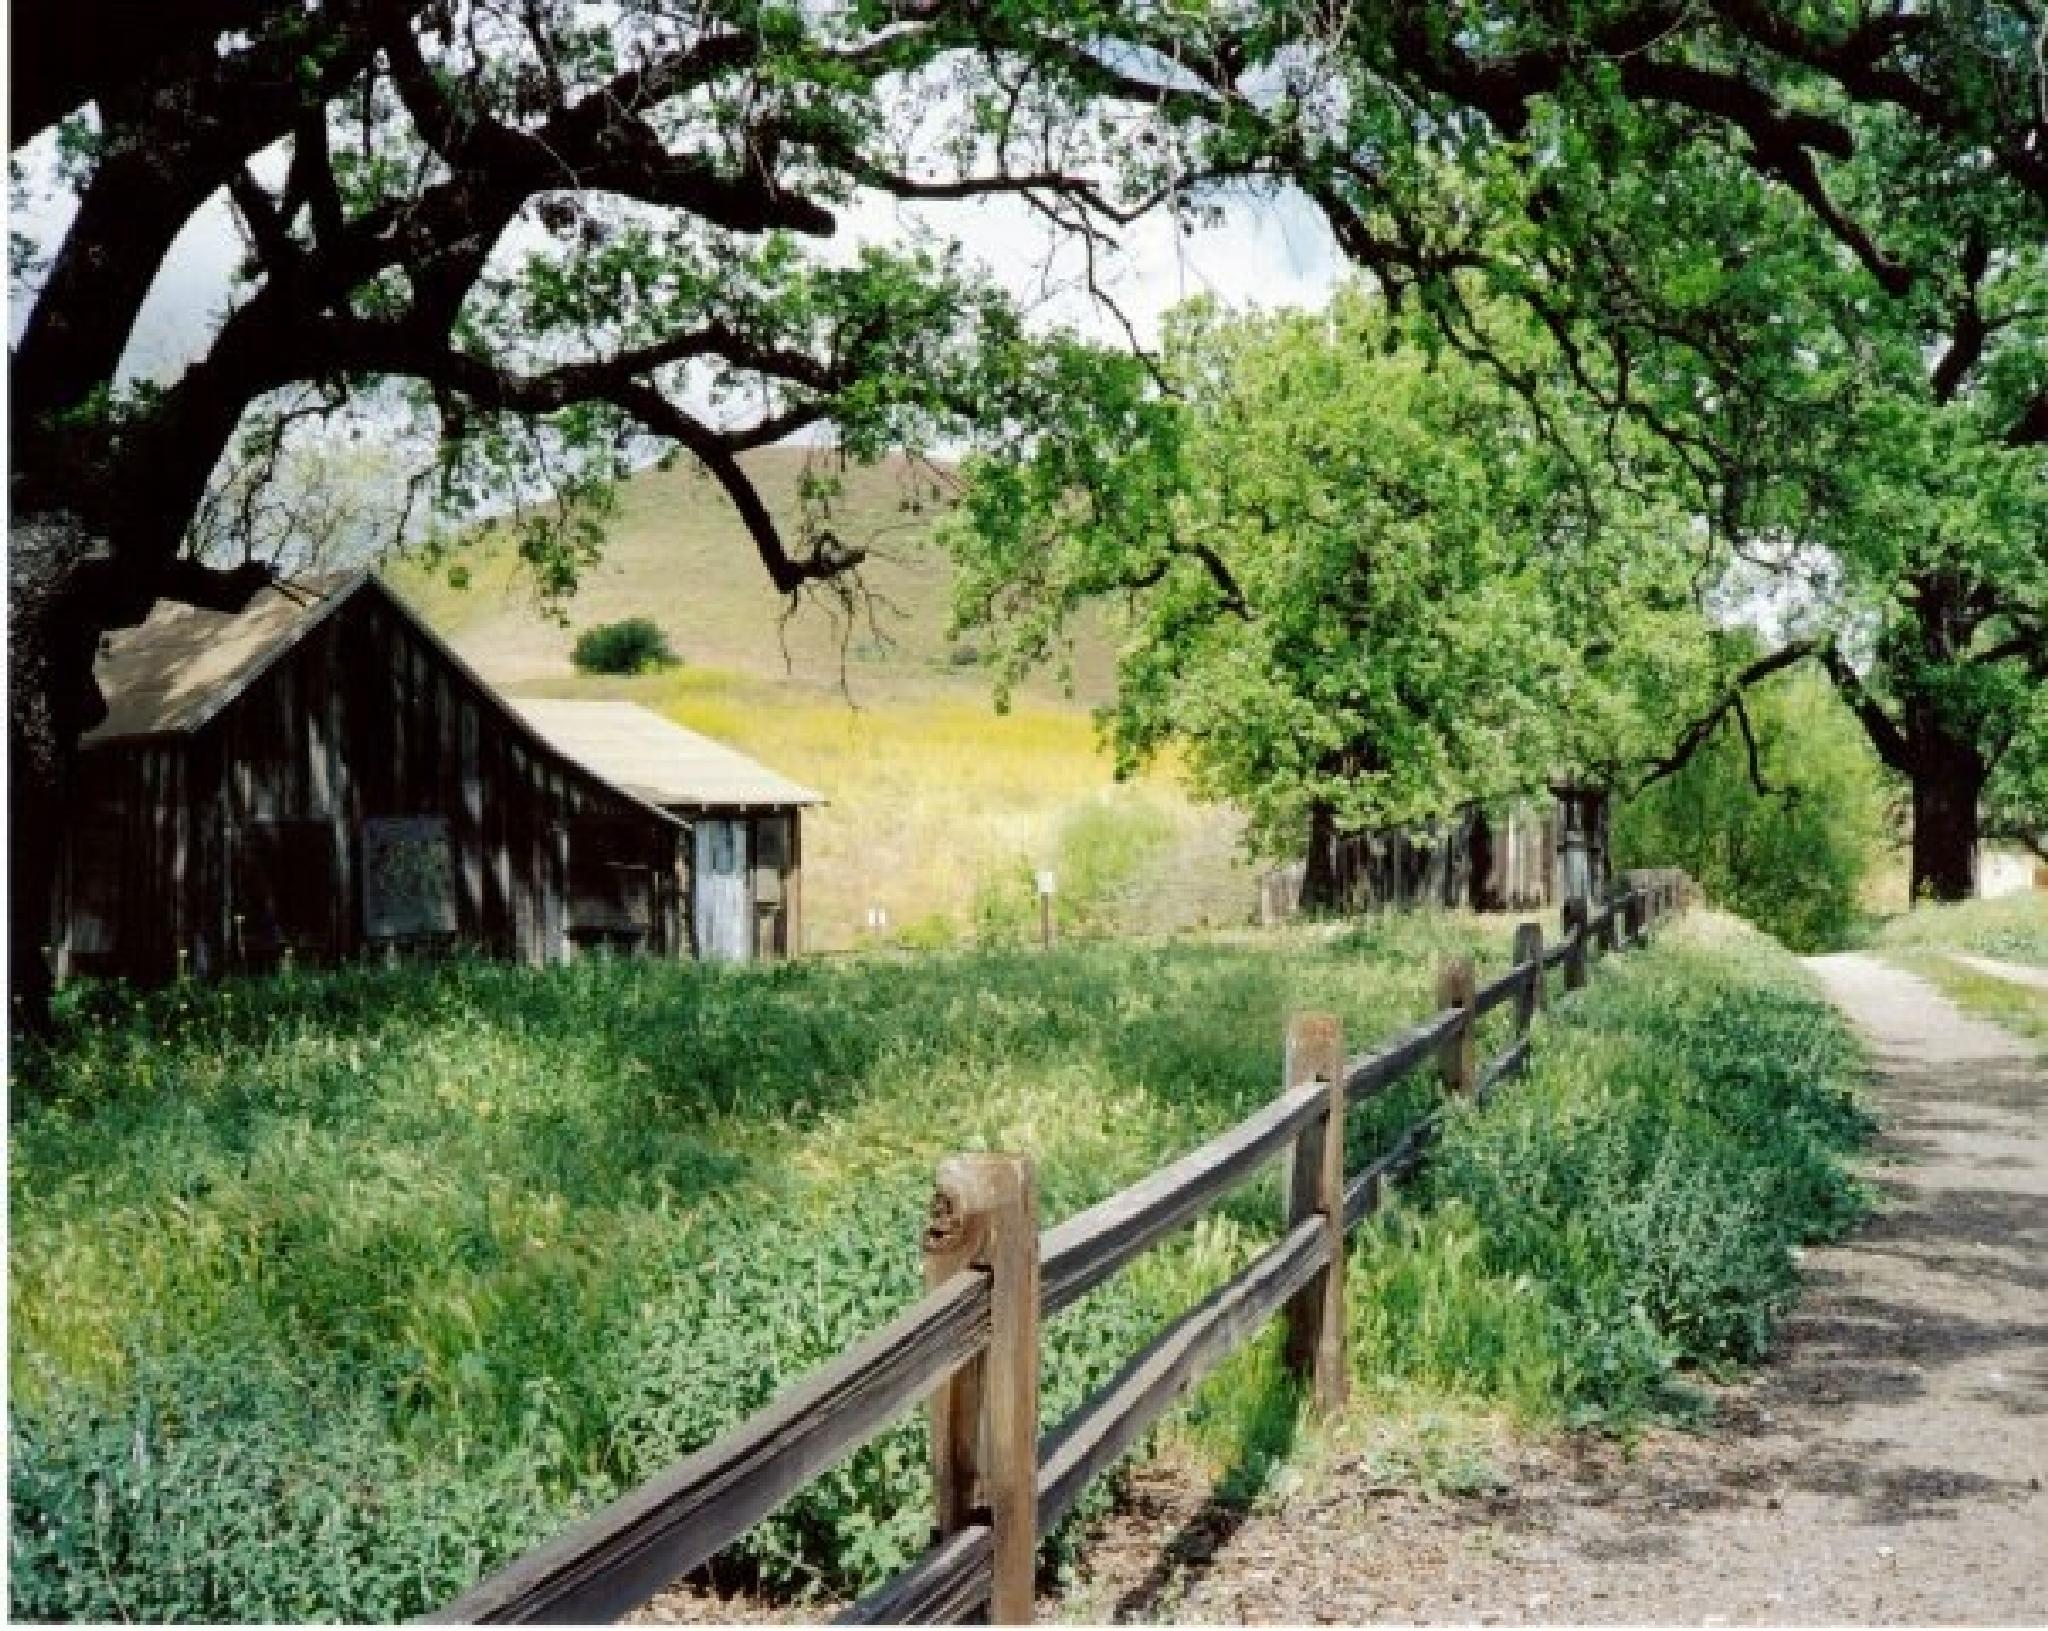 The ranch house by fredda.j.thomas